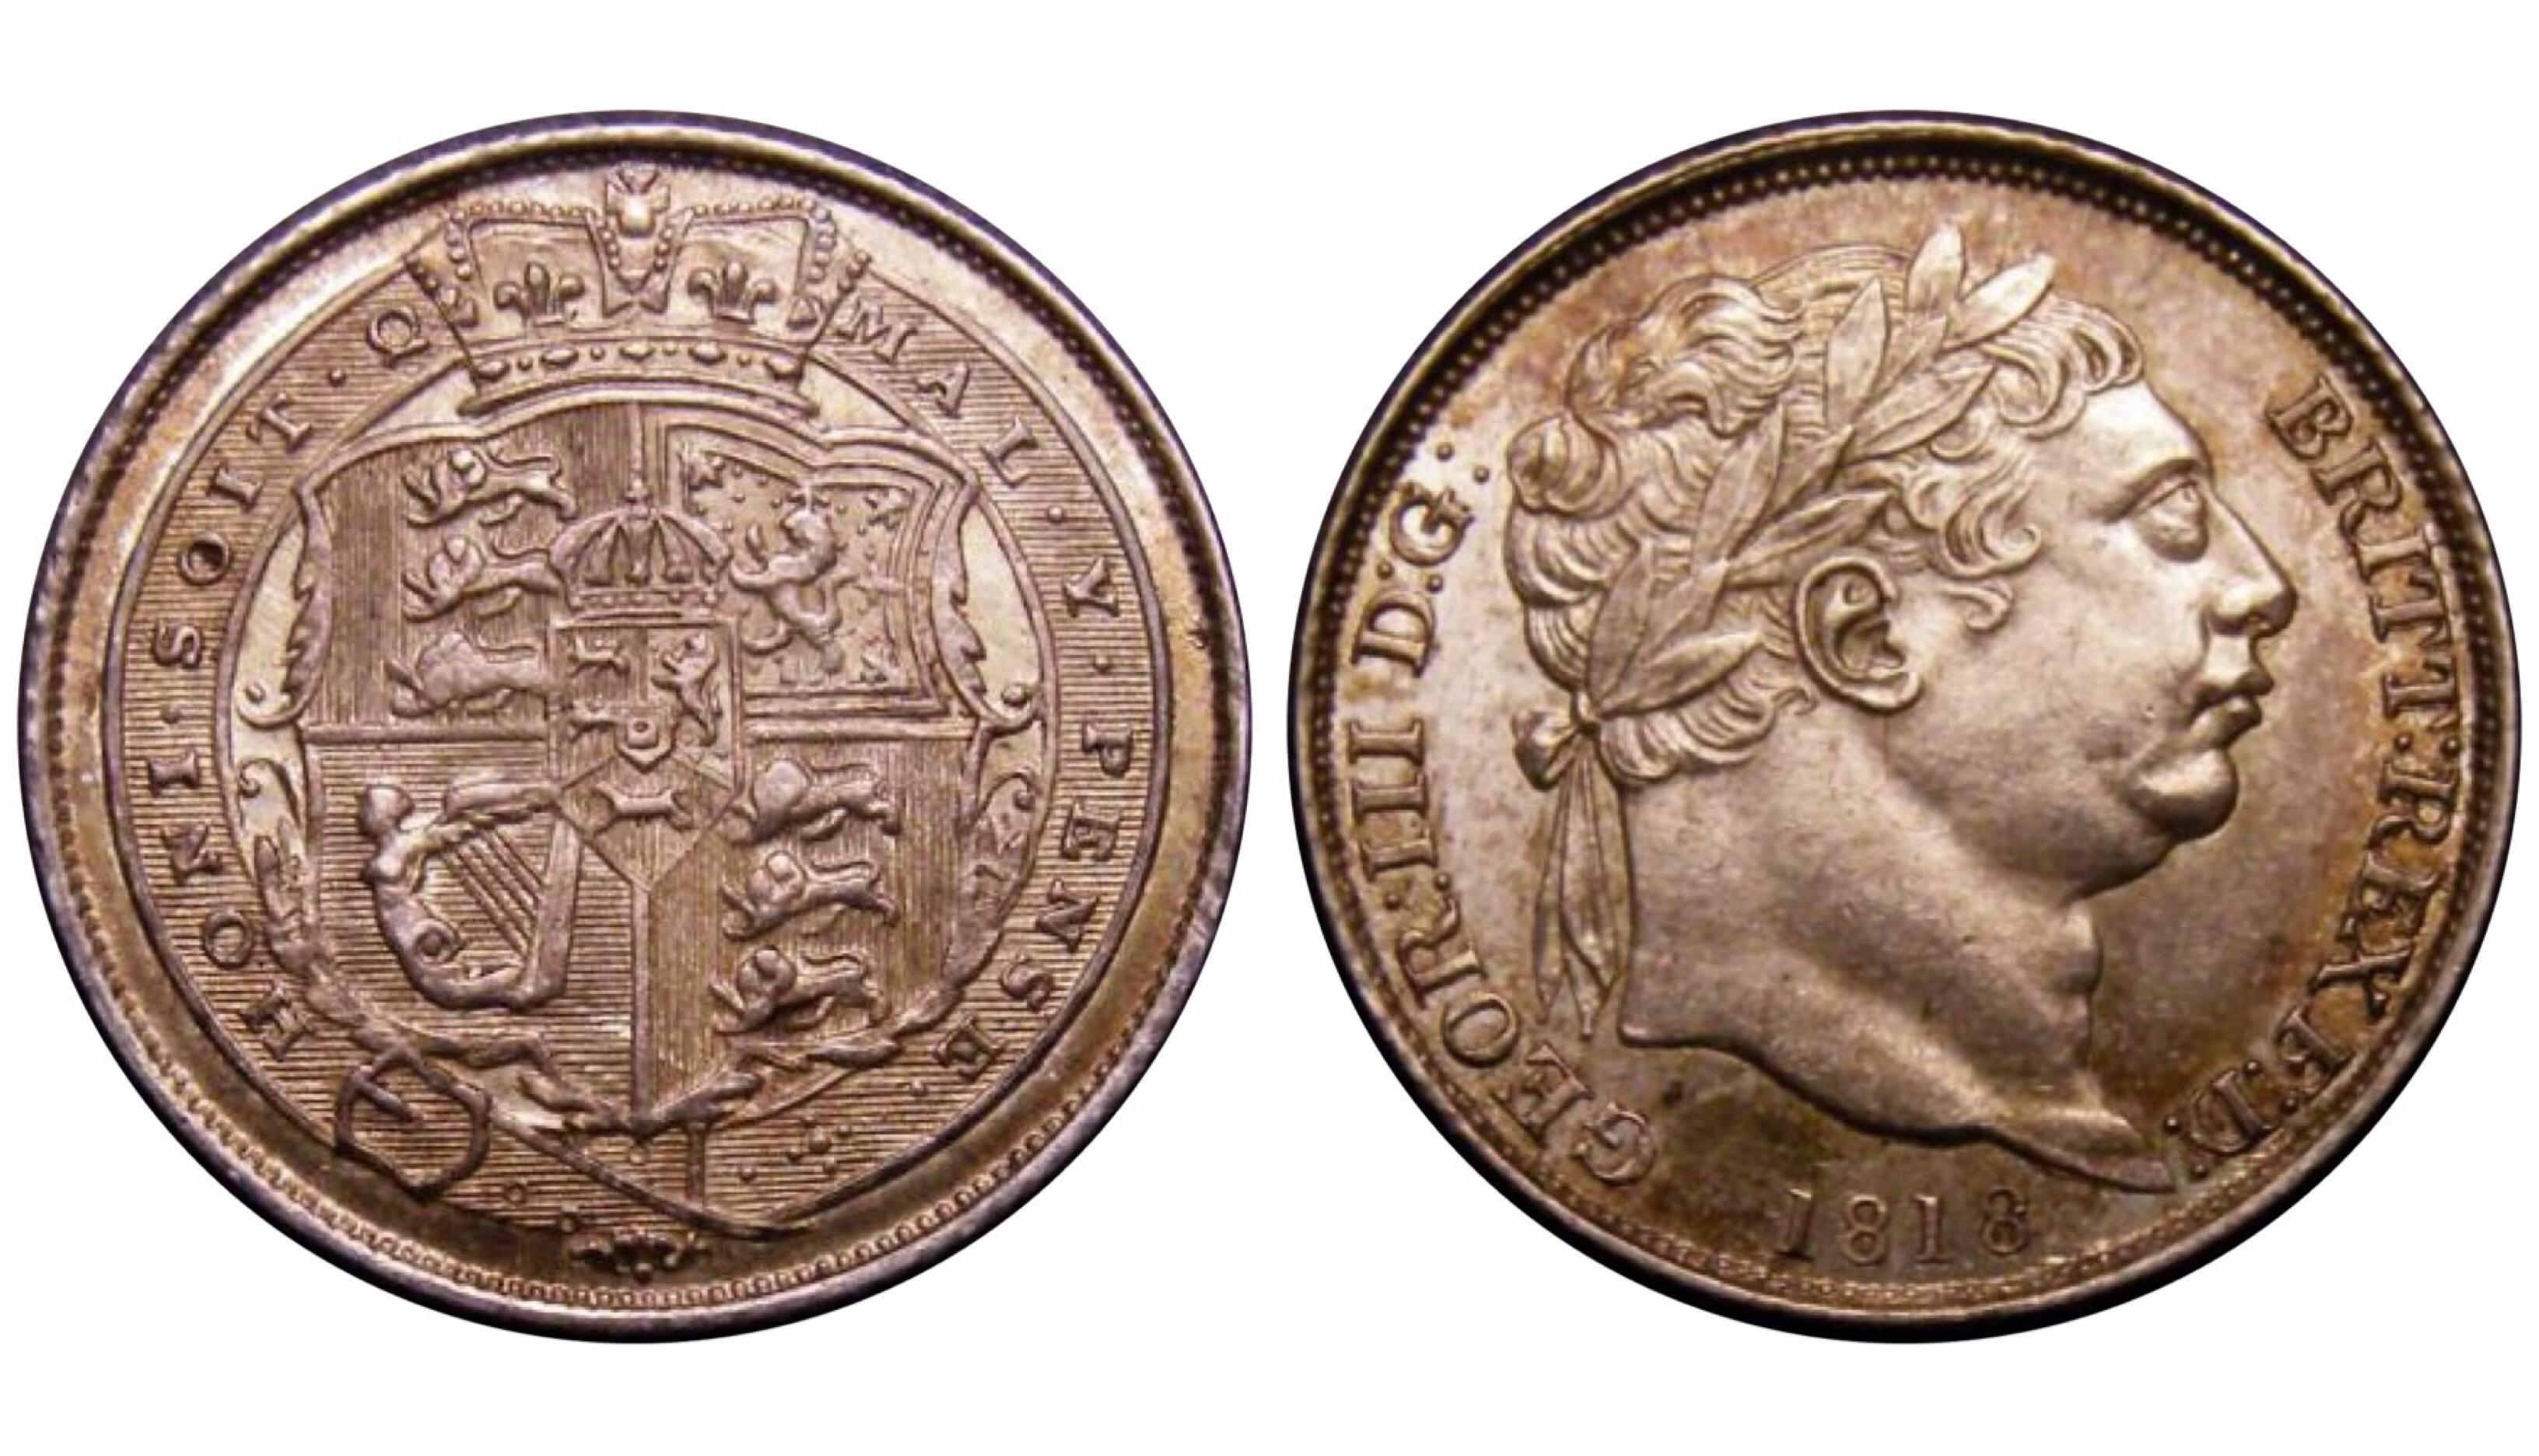 1818 Sixpence, CGS 78(MS63-64), UNC, George III, UIN 22900